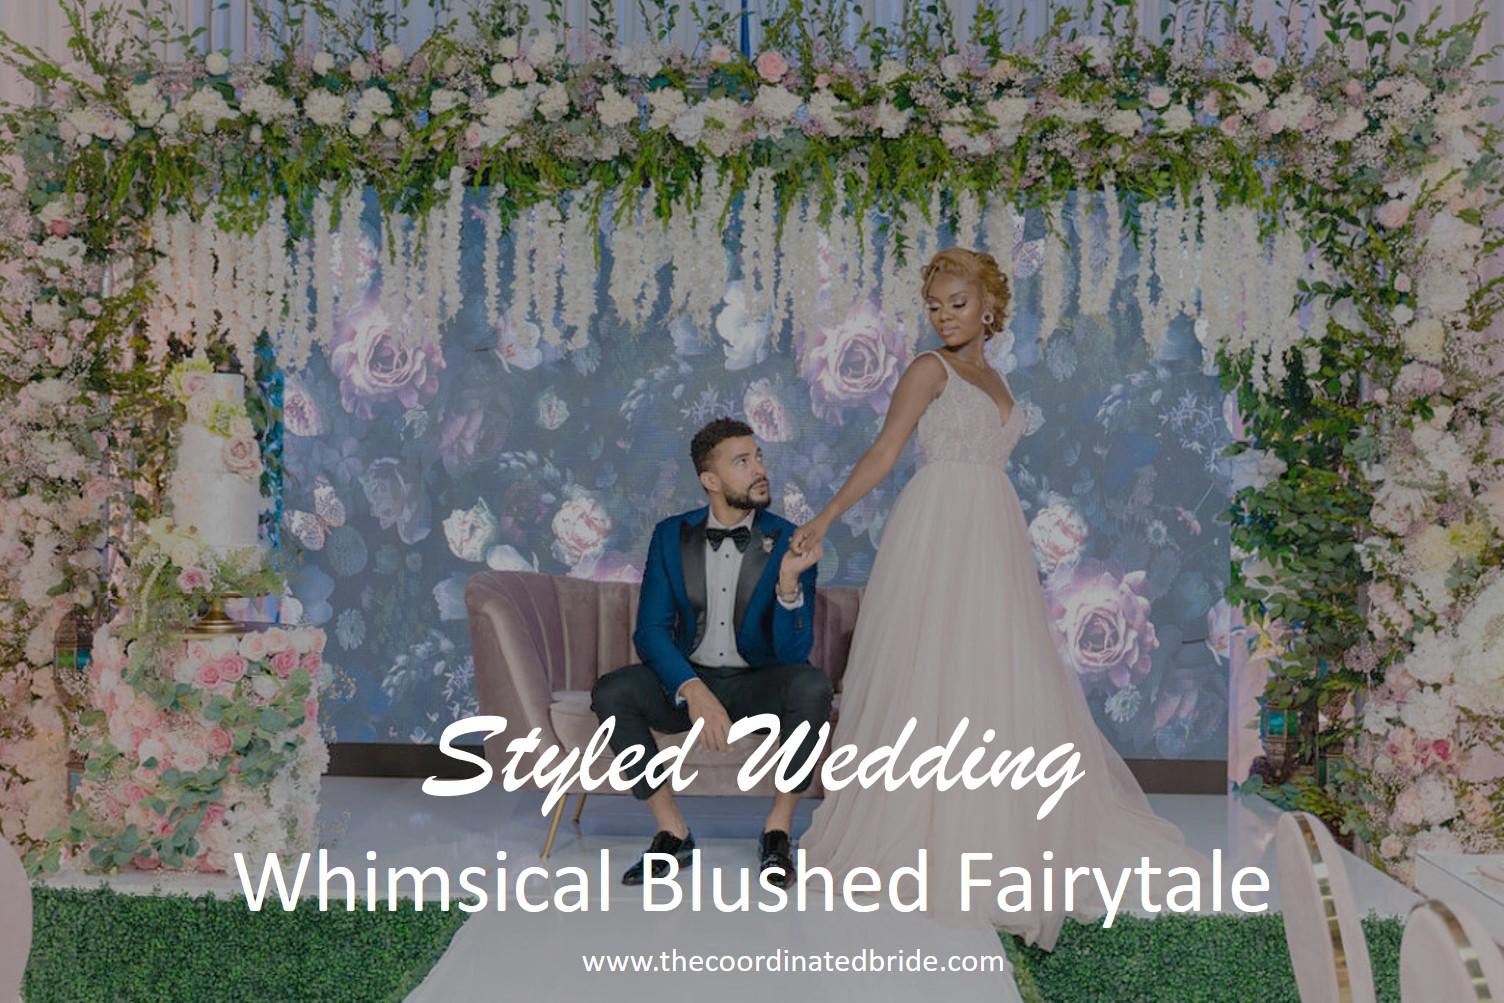 A Whimsical Blush Fairytale Styled Wedding